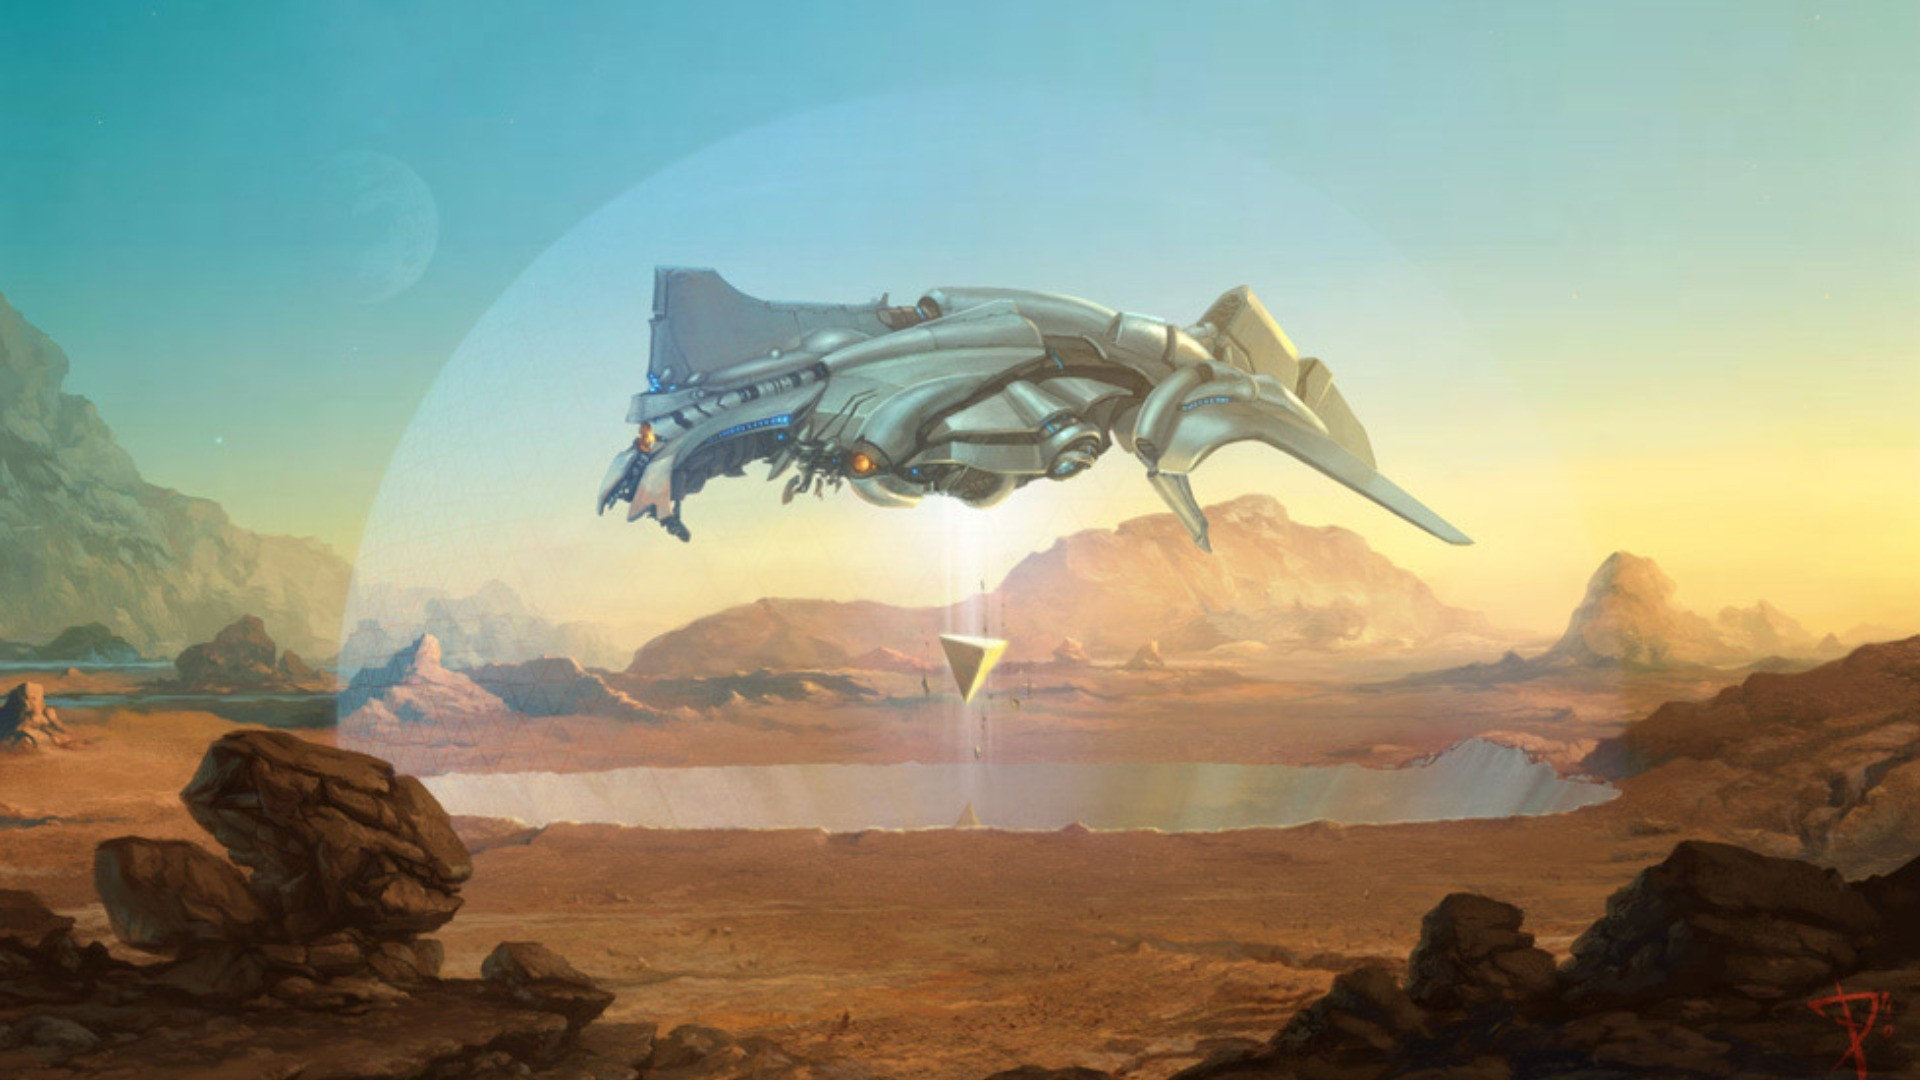 Stefan Morrell Sci-Fi Concept Art | Stefan Morrell Science ... |Science Fiction Graphics